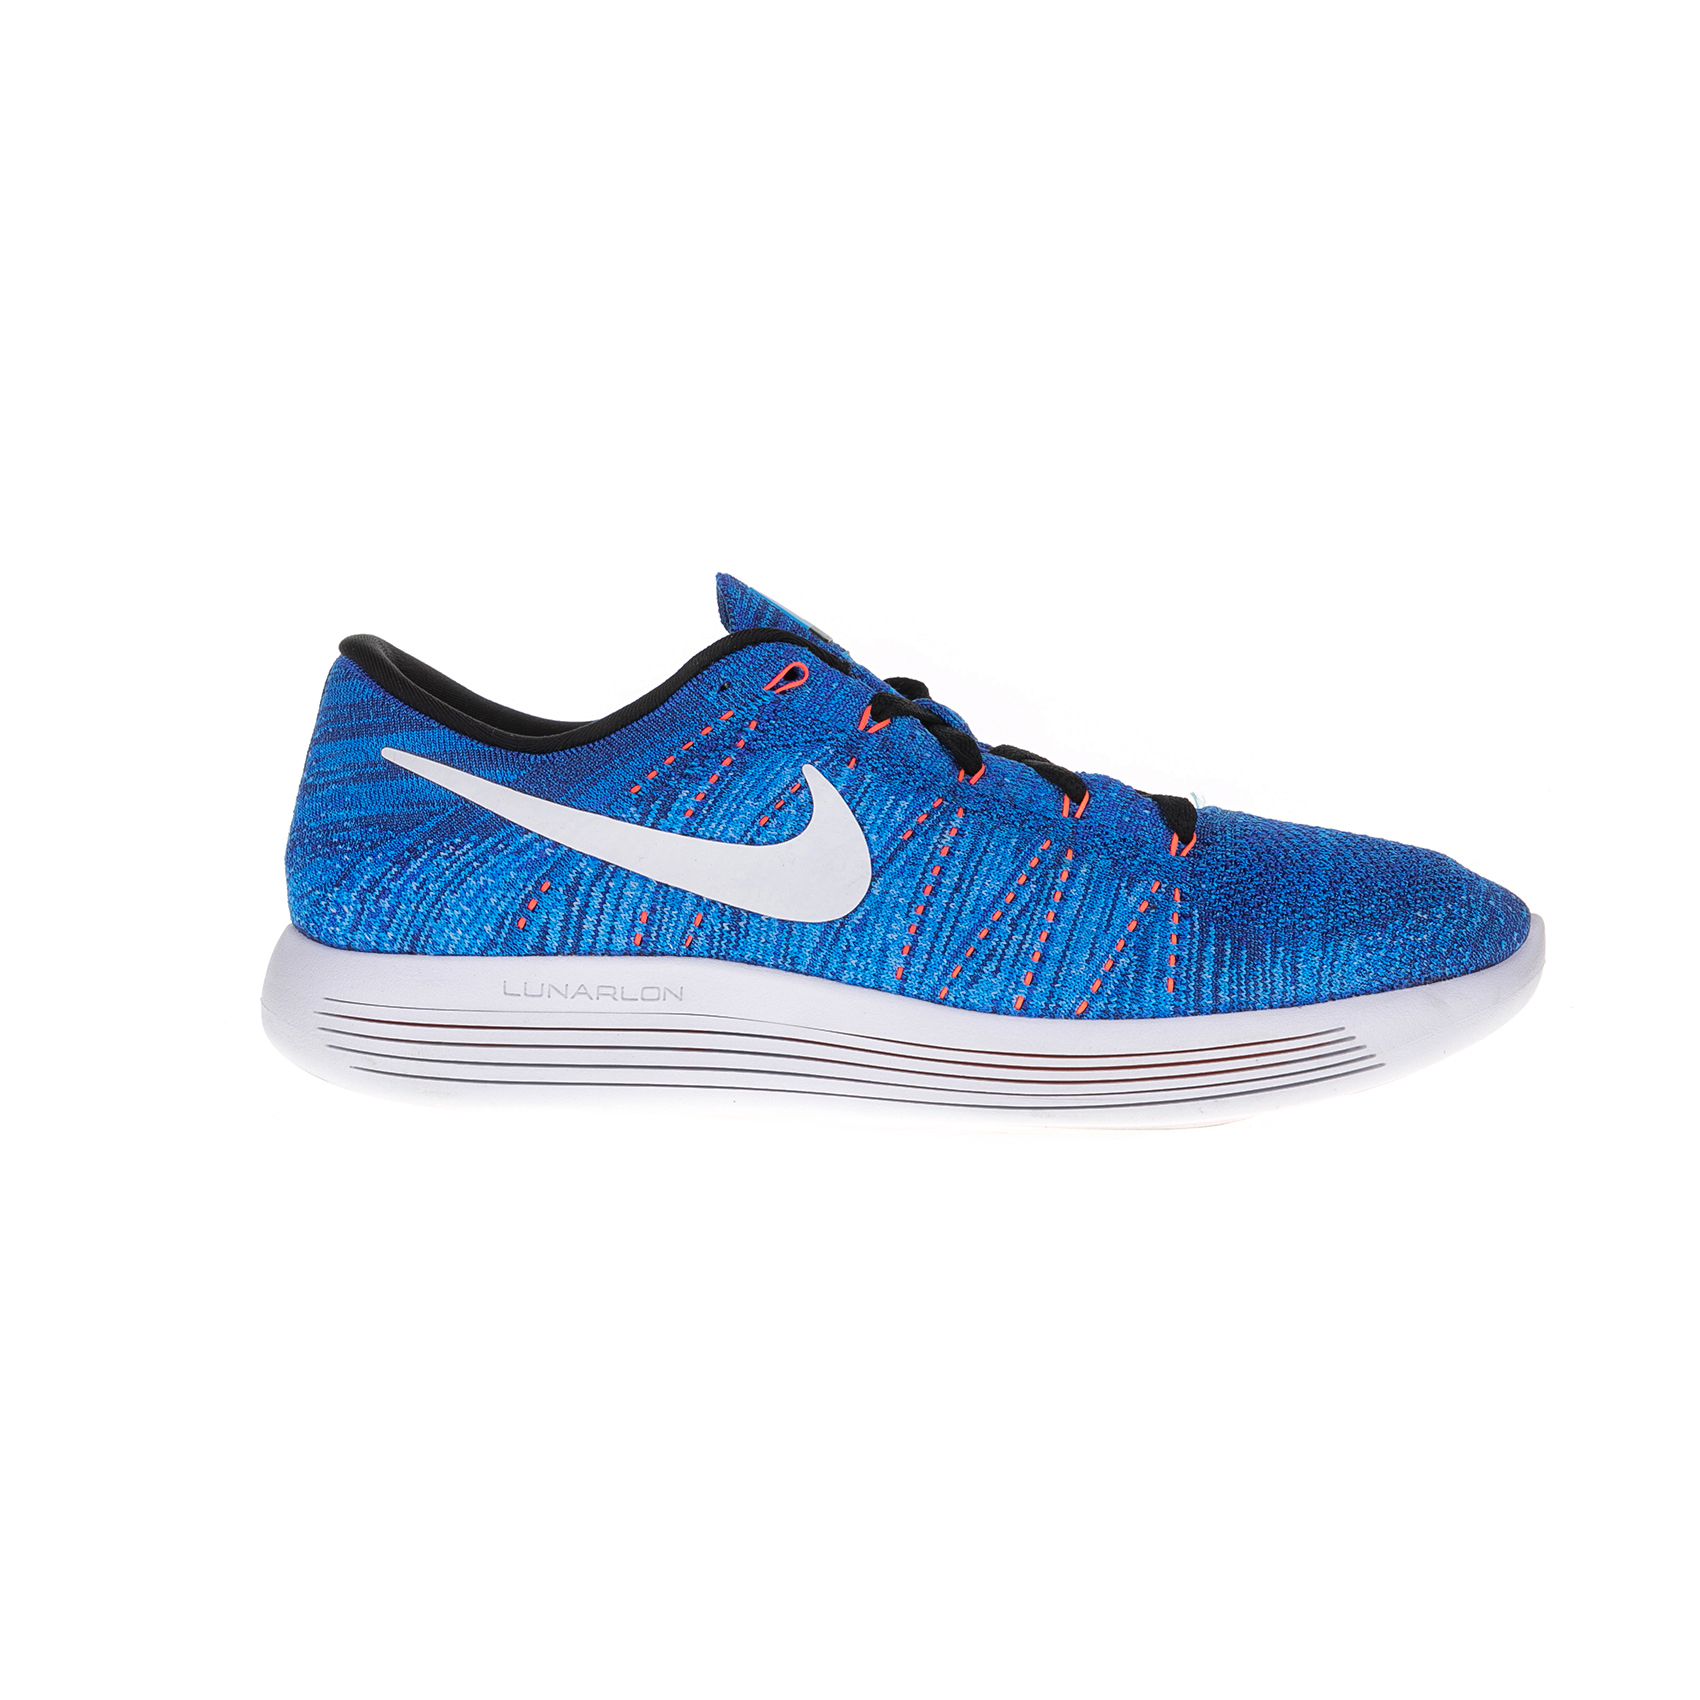 039030188a9 NIKE - Ανδρικά αθλητικά παπούτσια Nike LUNAREPIC LOW FLYKNIT μπλε